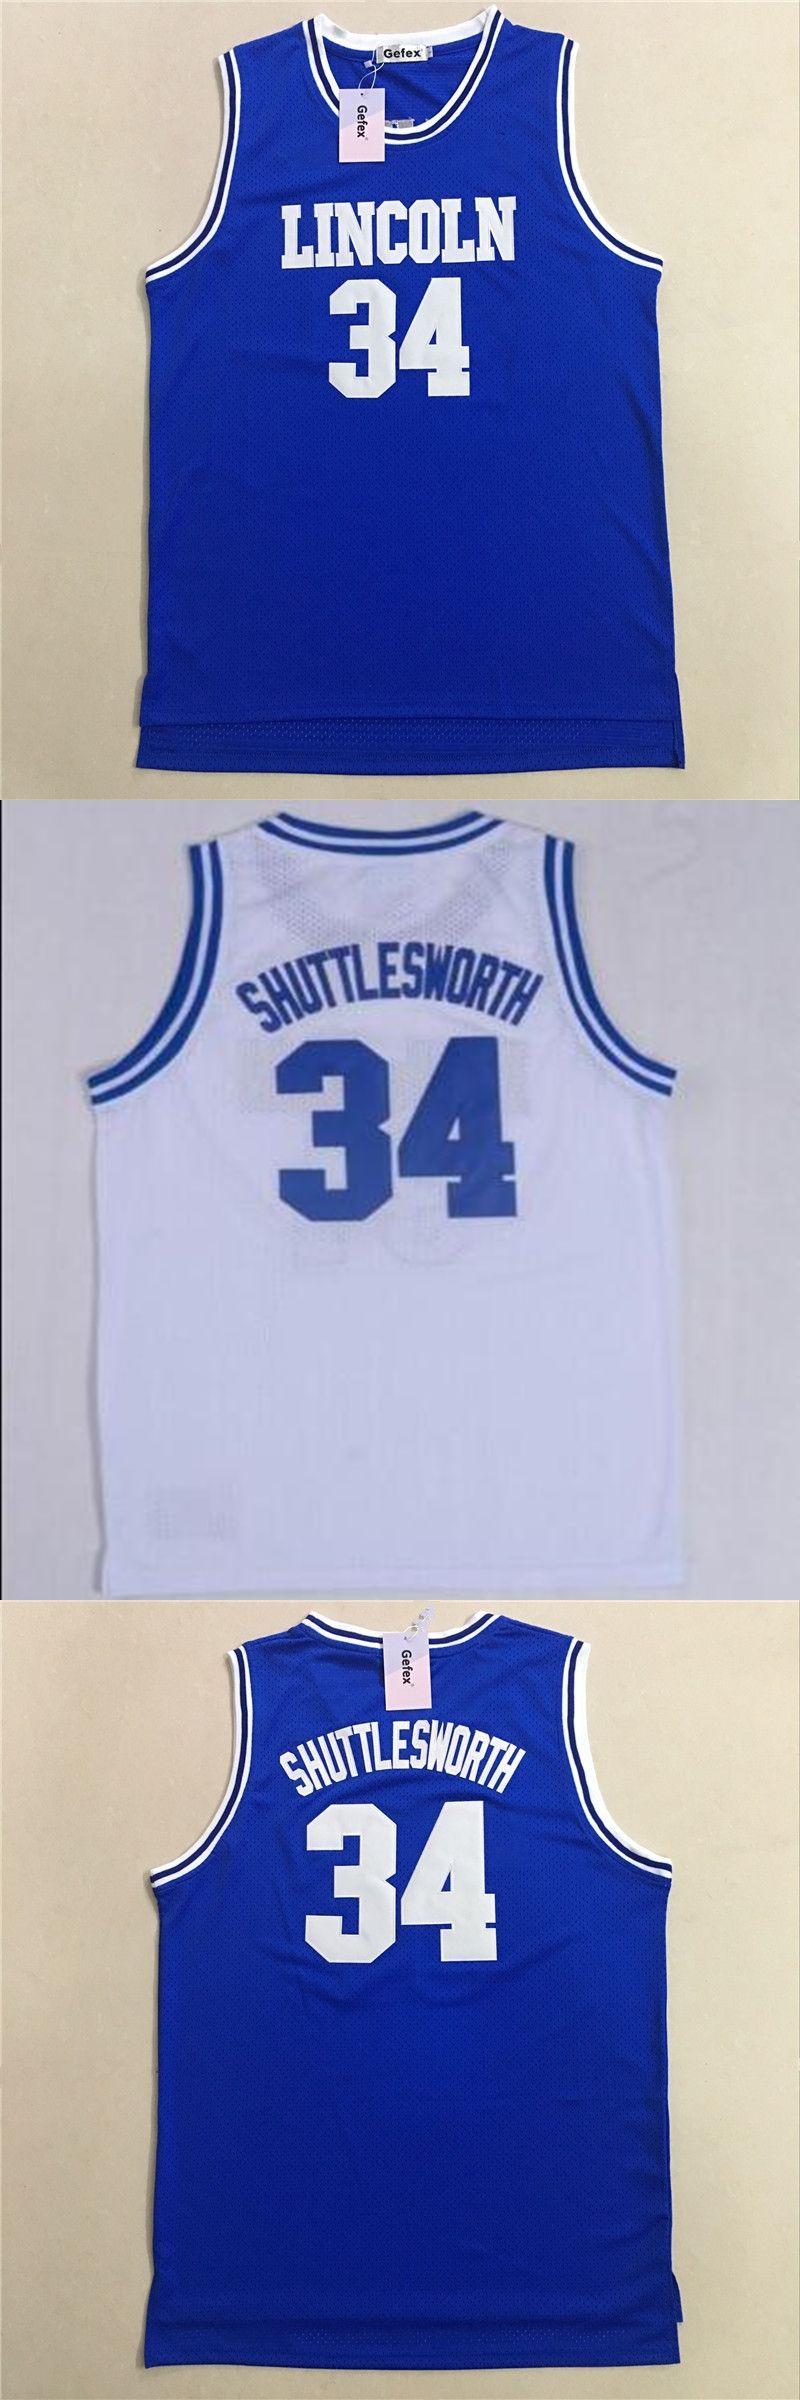 4f29fae94 Gefex Mens Jesus Shuttlesworth Lincoln Basketball Movie Jerseys  34 Ray  allen Jersey Stitched Throwback Basketball blue white je